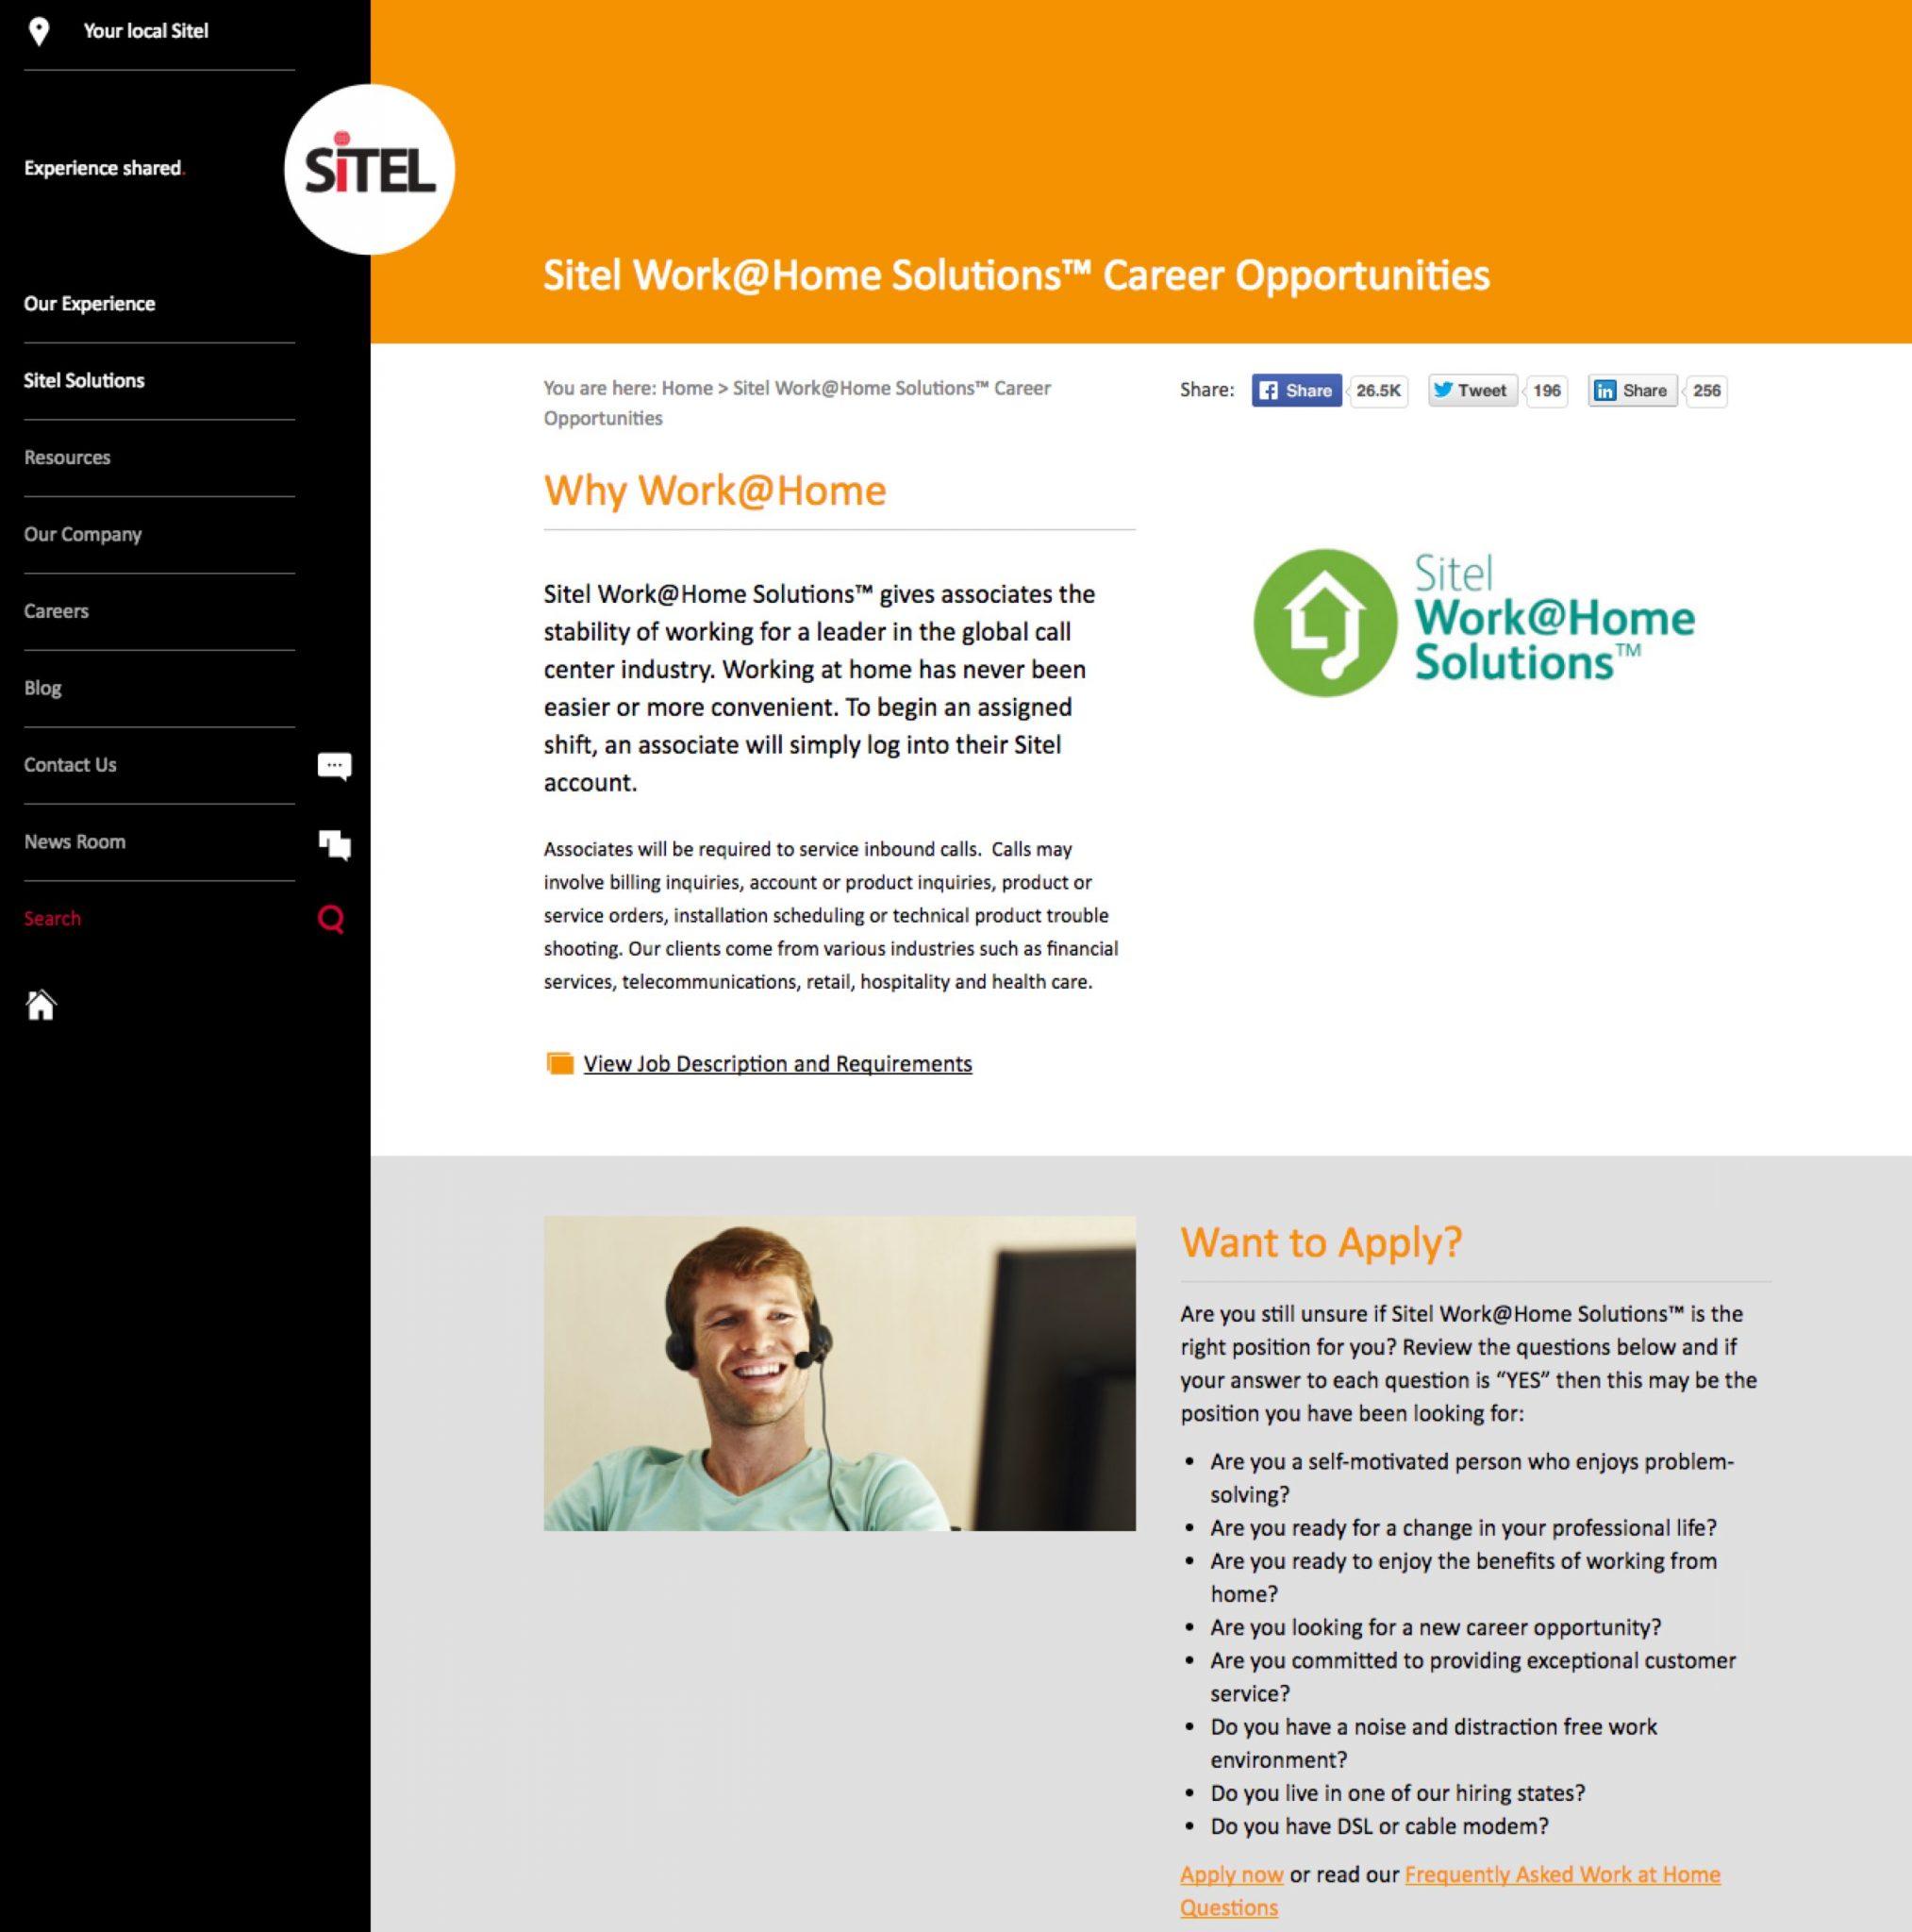 Work at Home Virtual Microsites | SiTEL | Ongig Blog